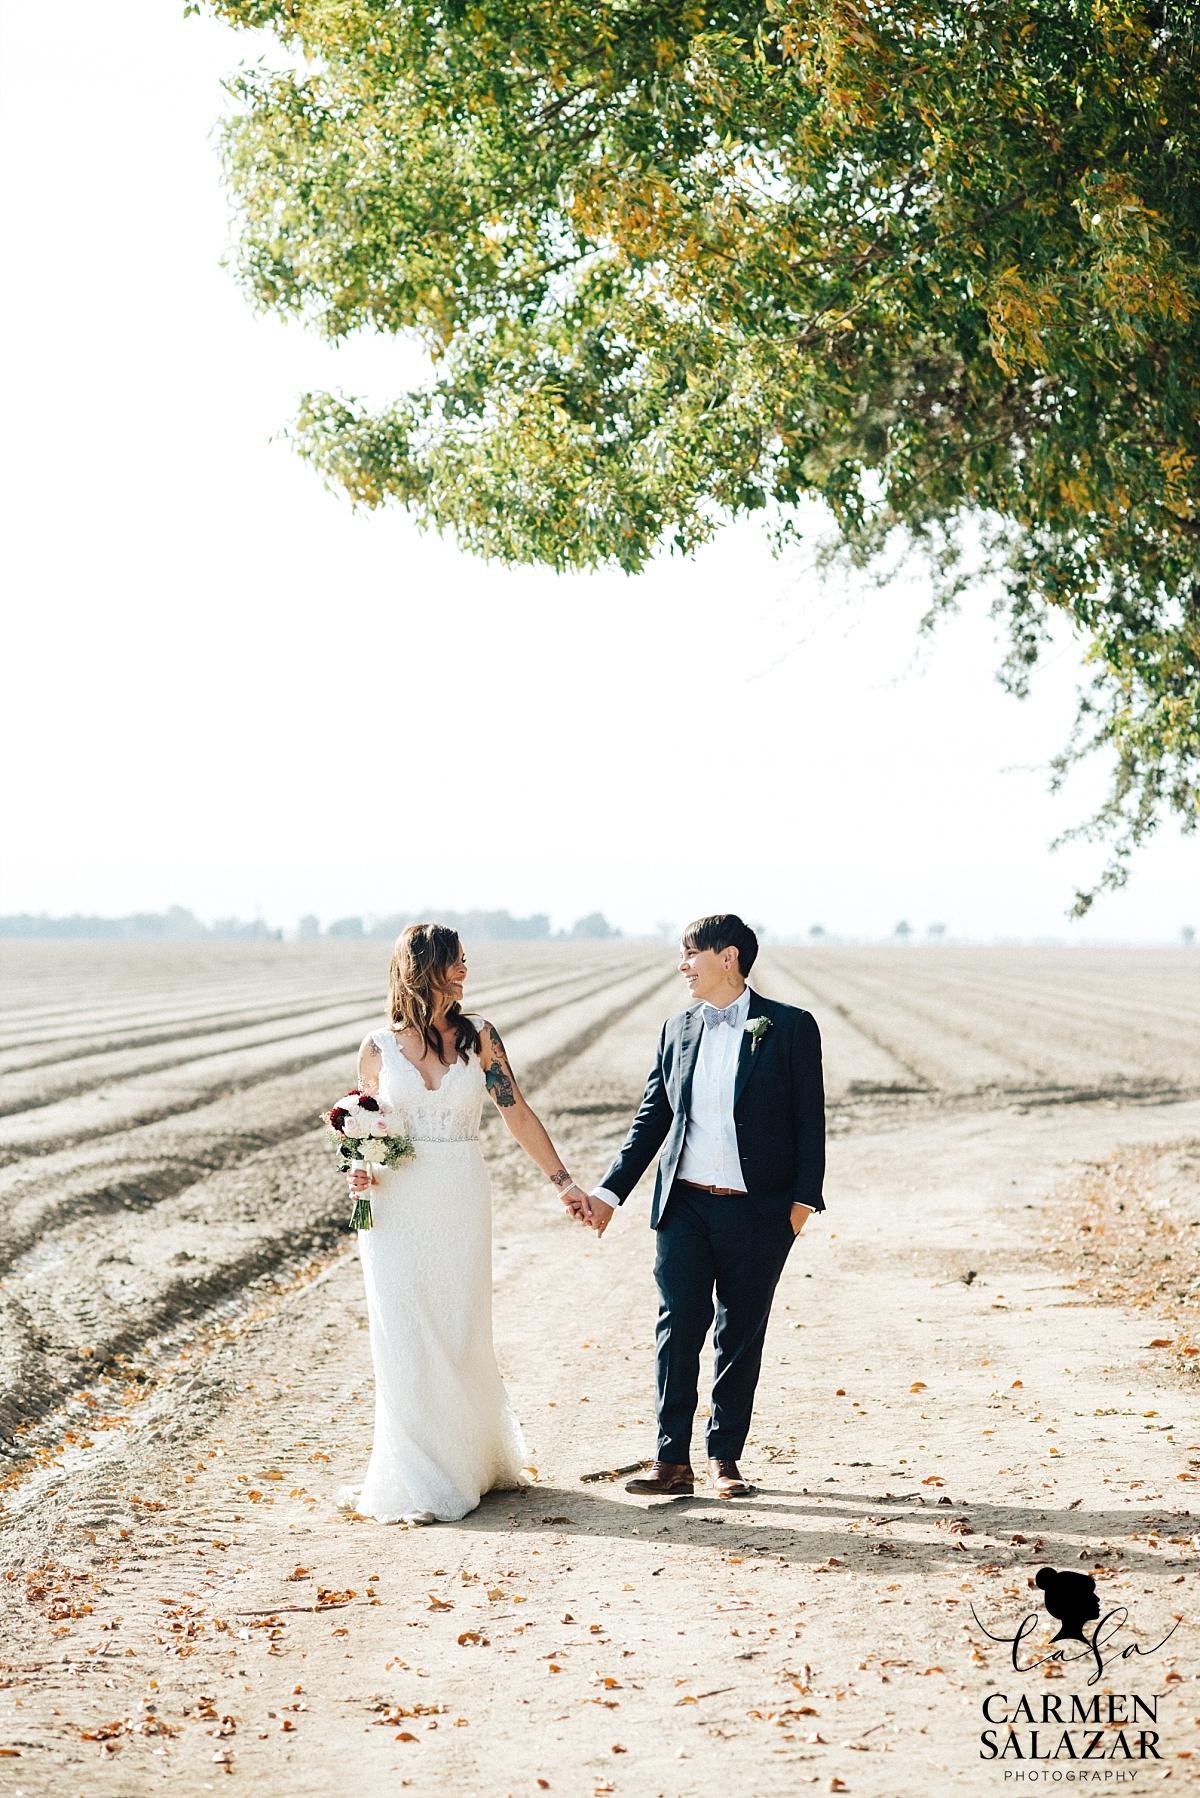 Grimes, CA outdoor wedding photography - Carmen Salazar